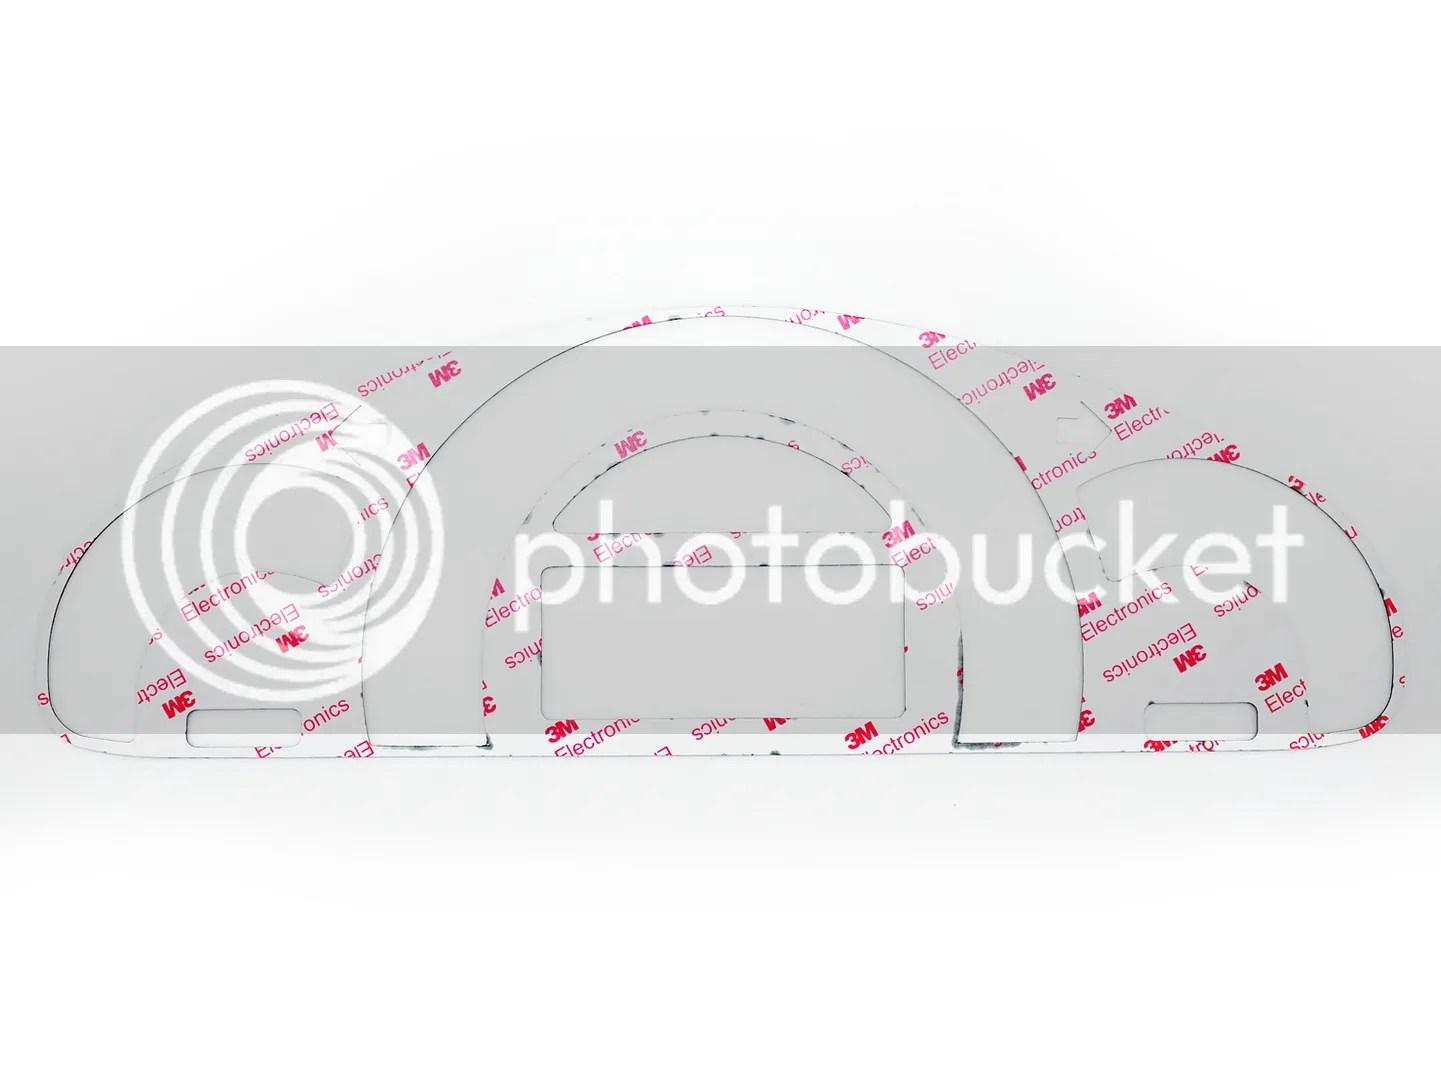 Carbon Cf Cluster Dashboard Meter Gauge Cover Fits